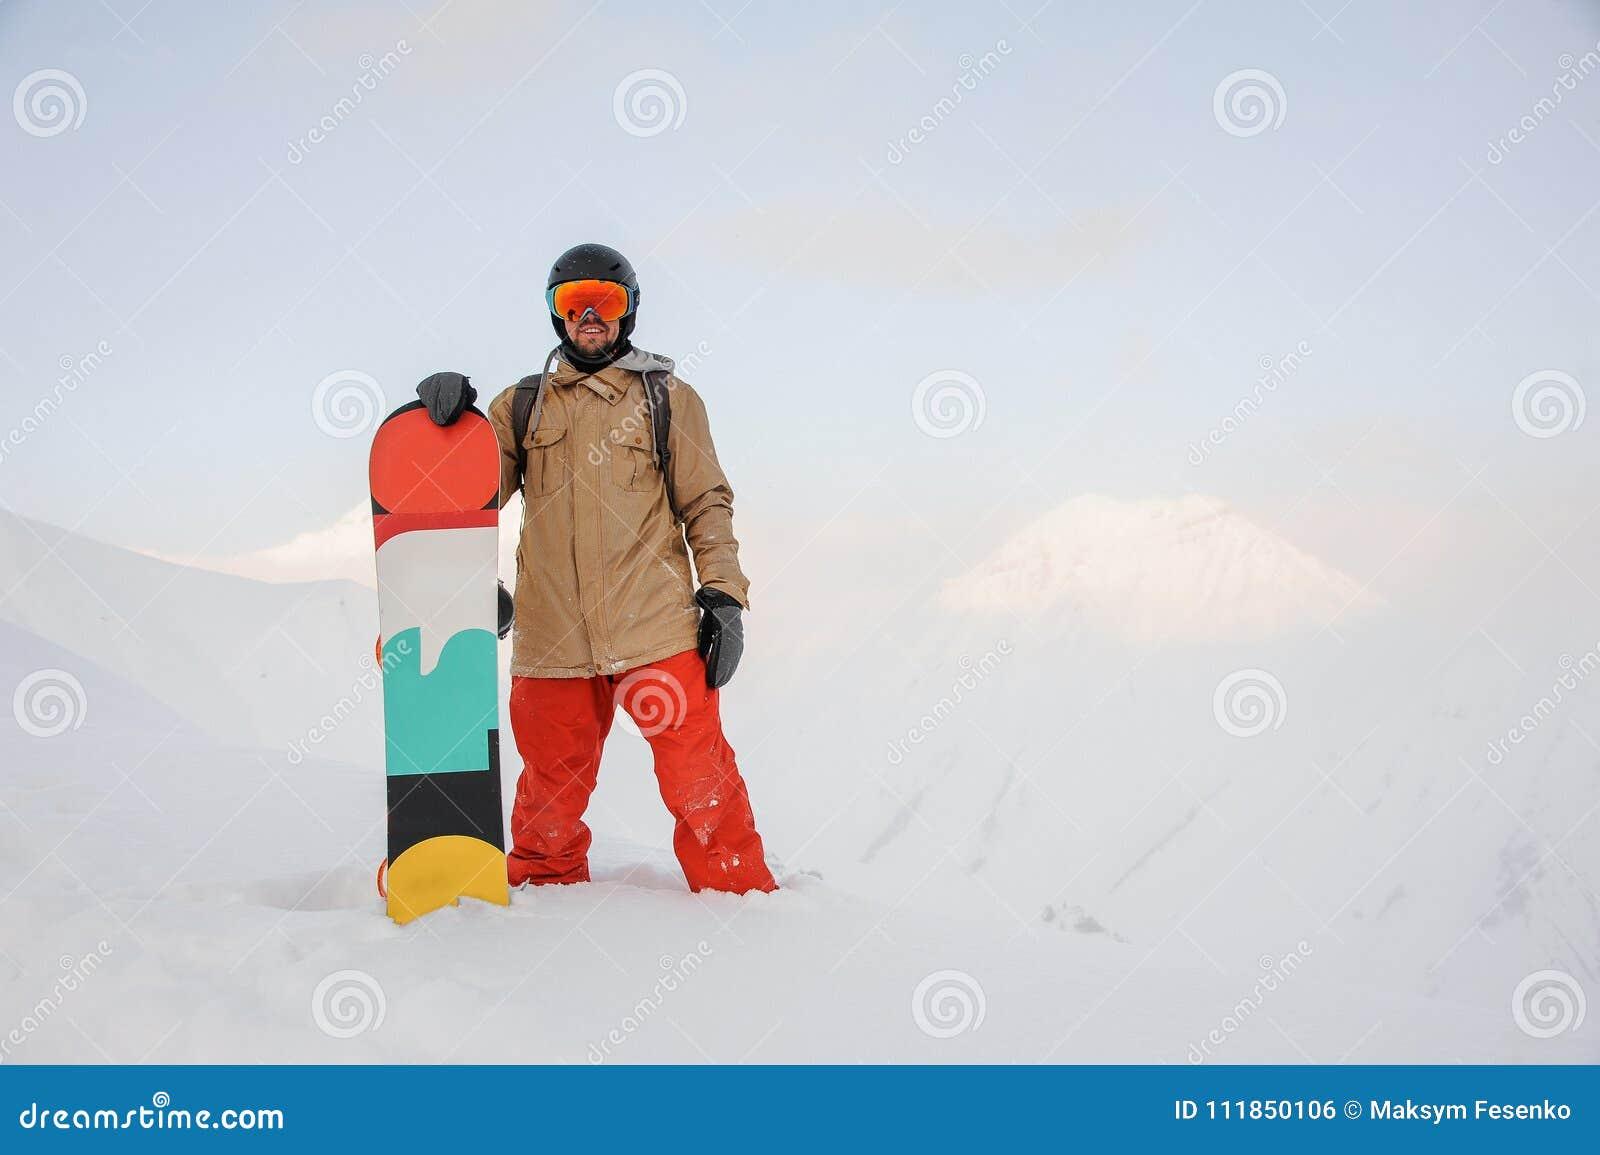 Test de ochelari de snowboard - comparații. Com 2021